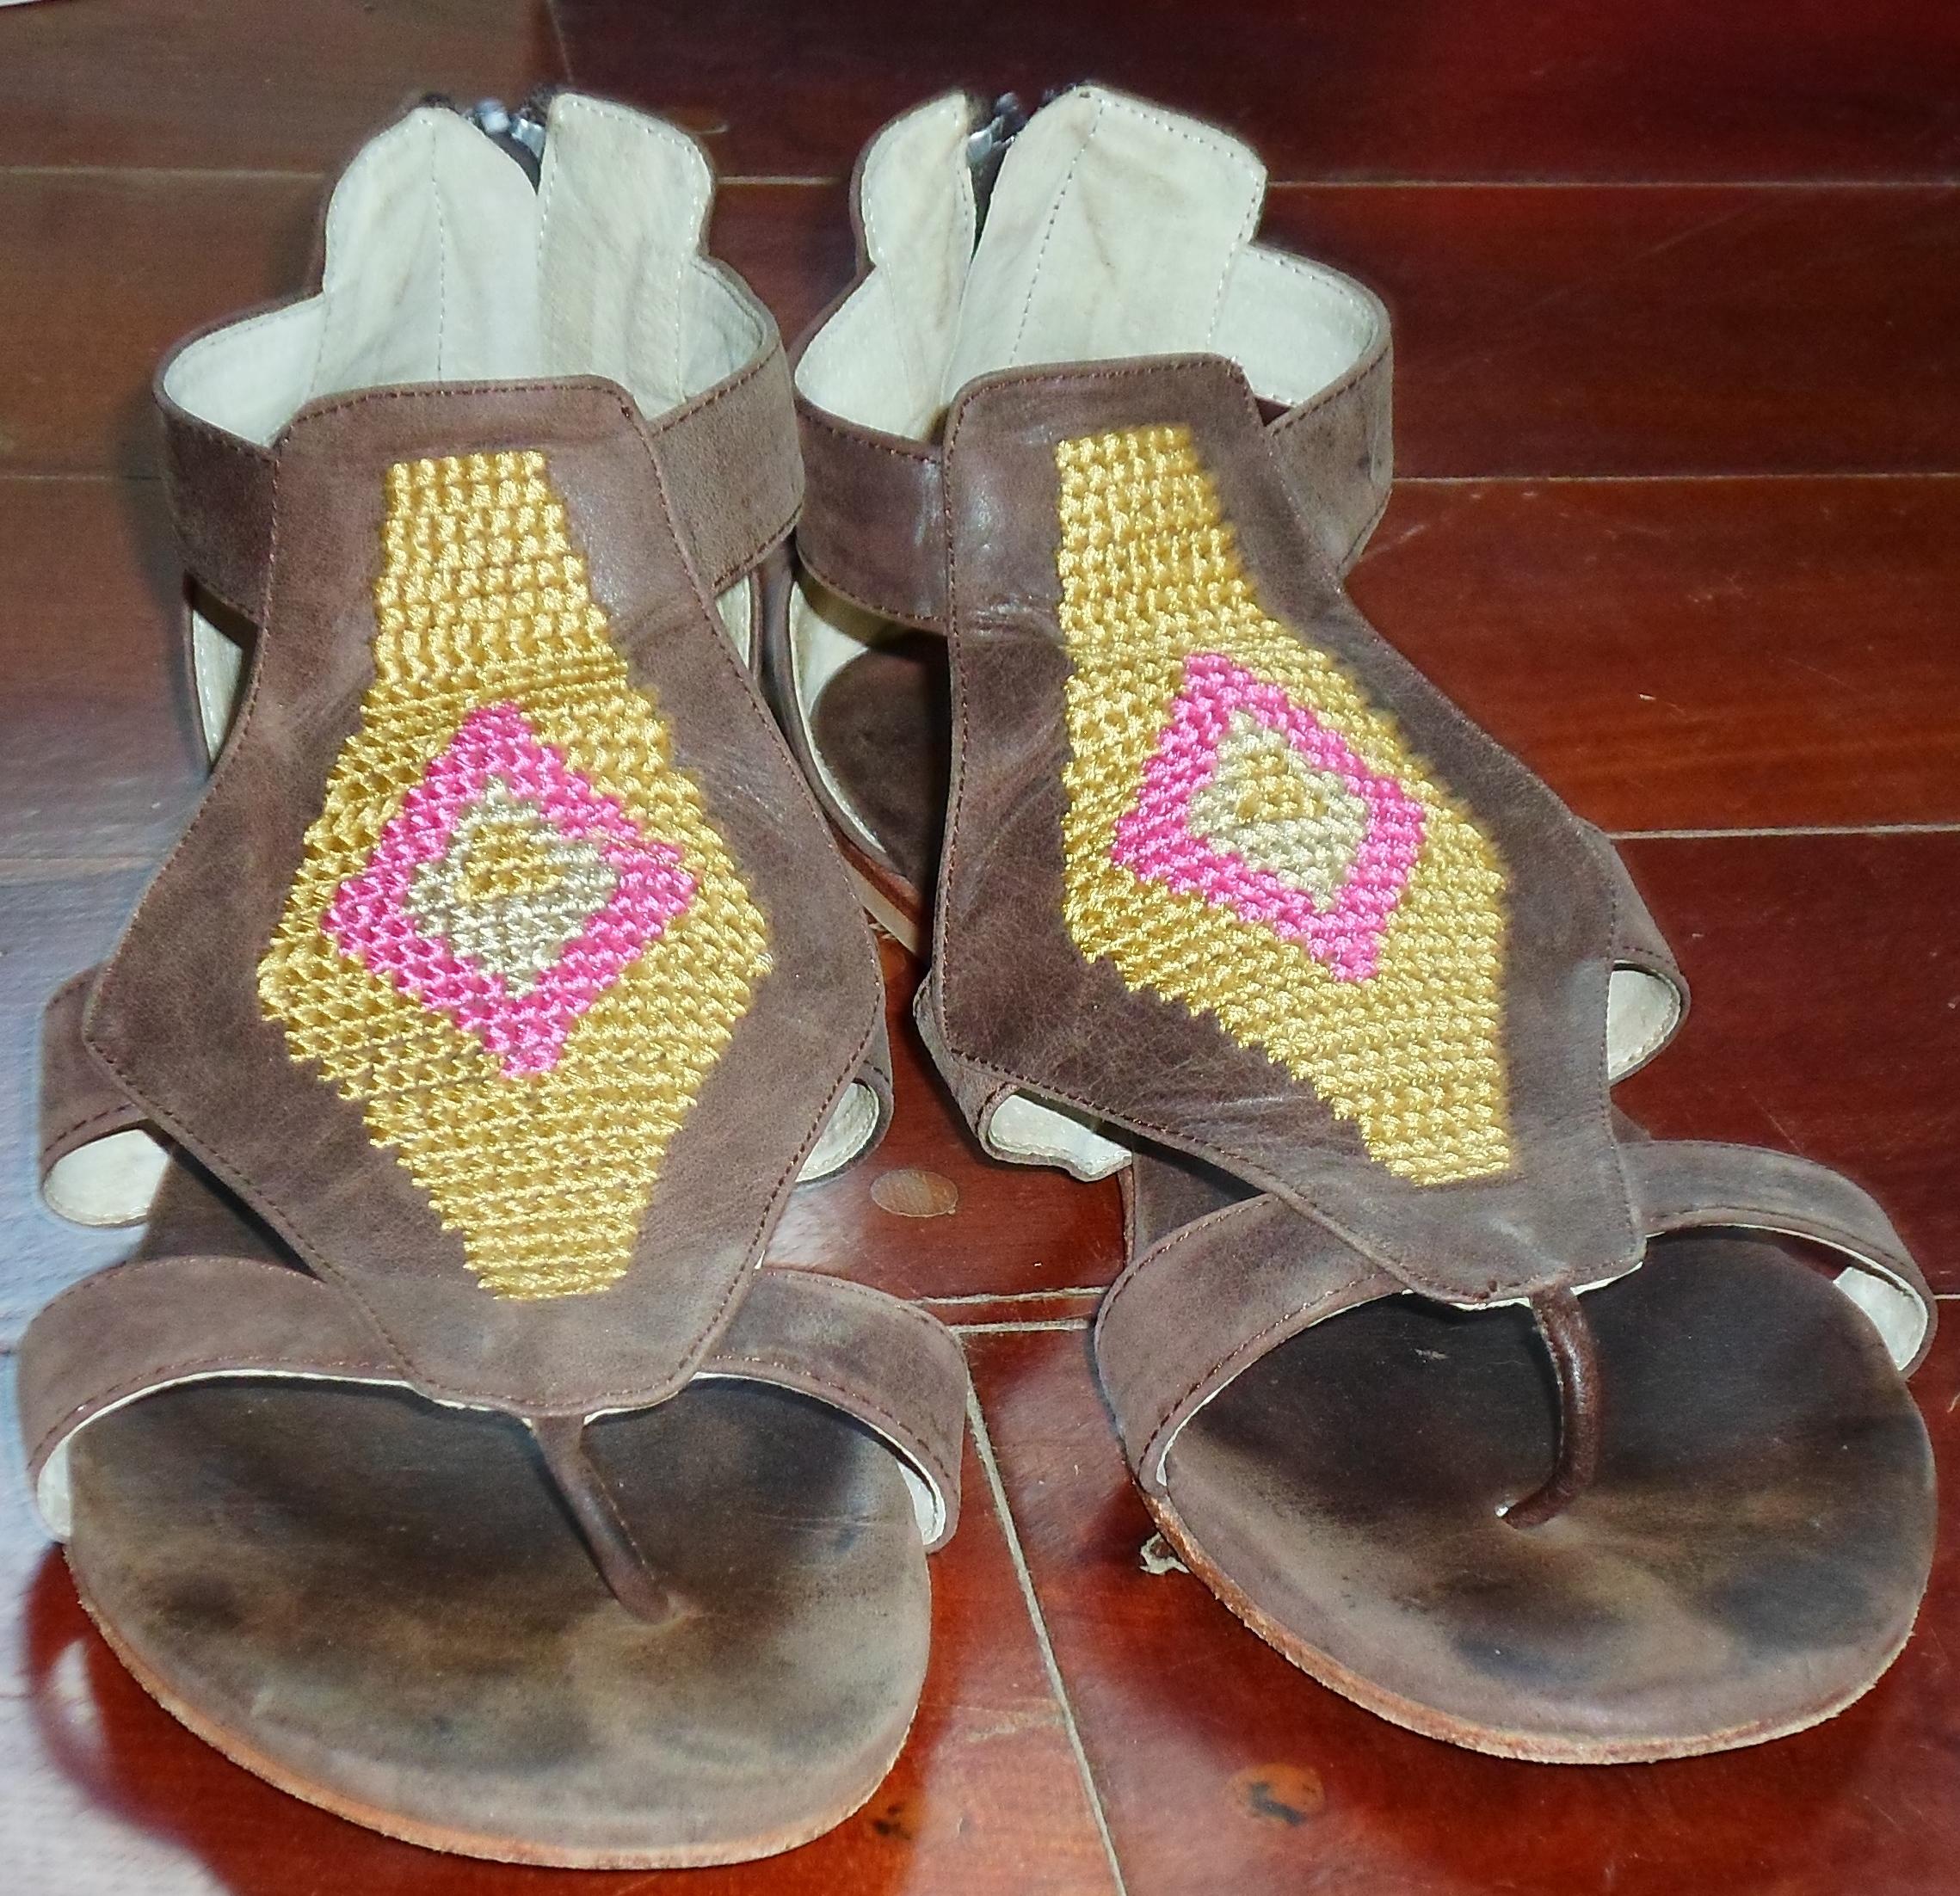 Mujer – Mercado En Y Usados De Crochetamp; Yoga Libre Niña Zapatos qGVSzjLUpM